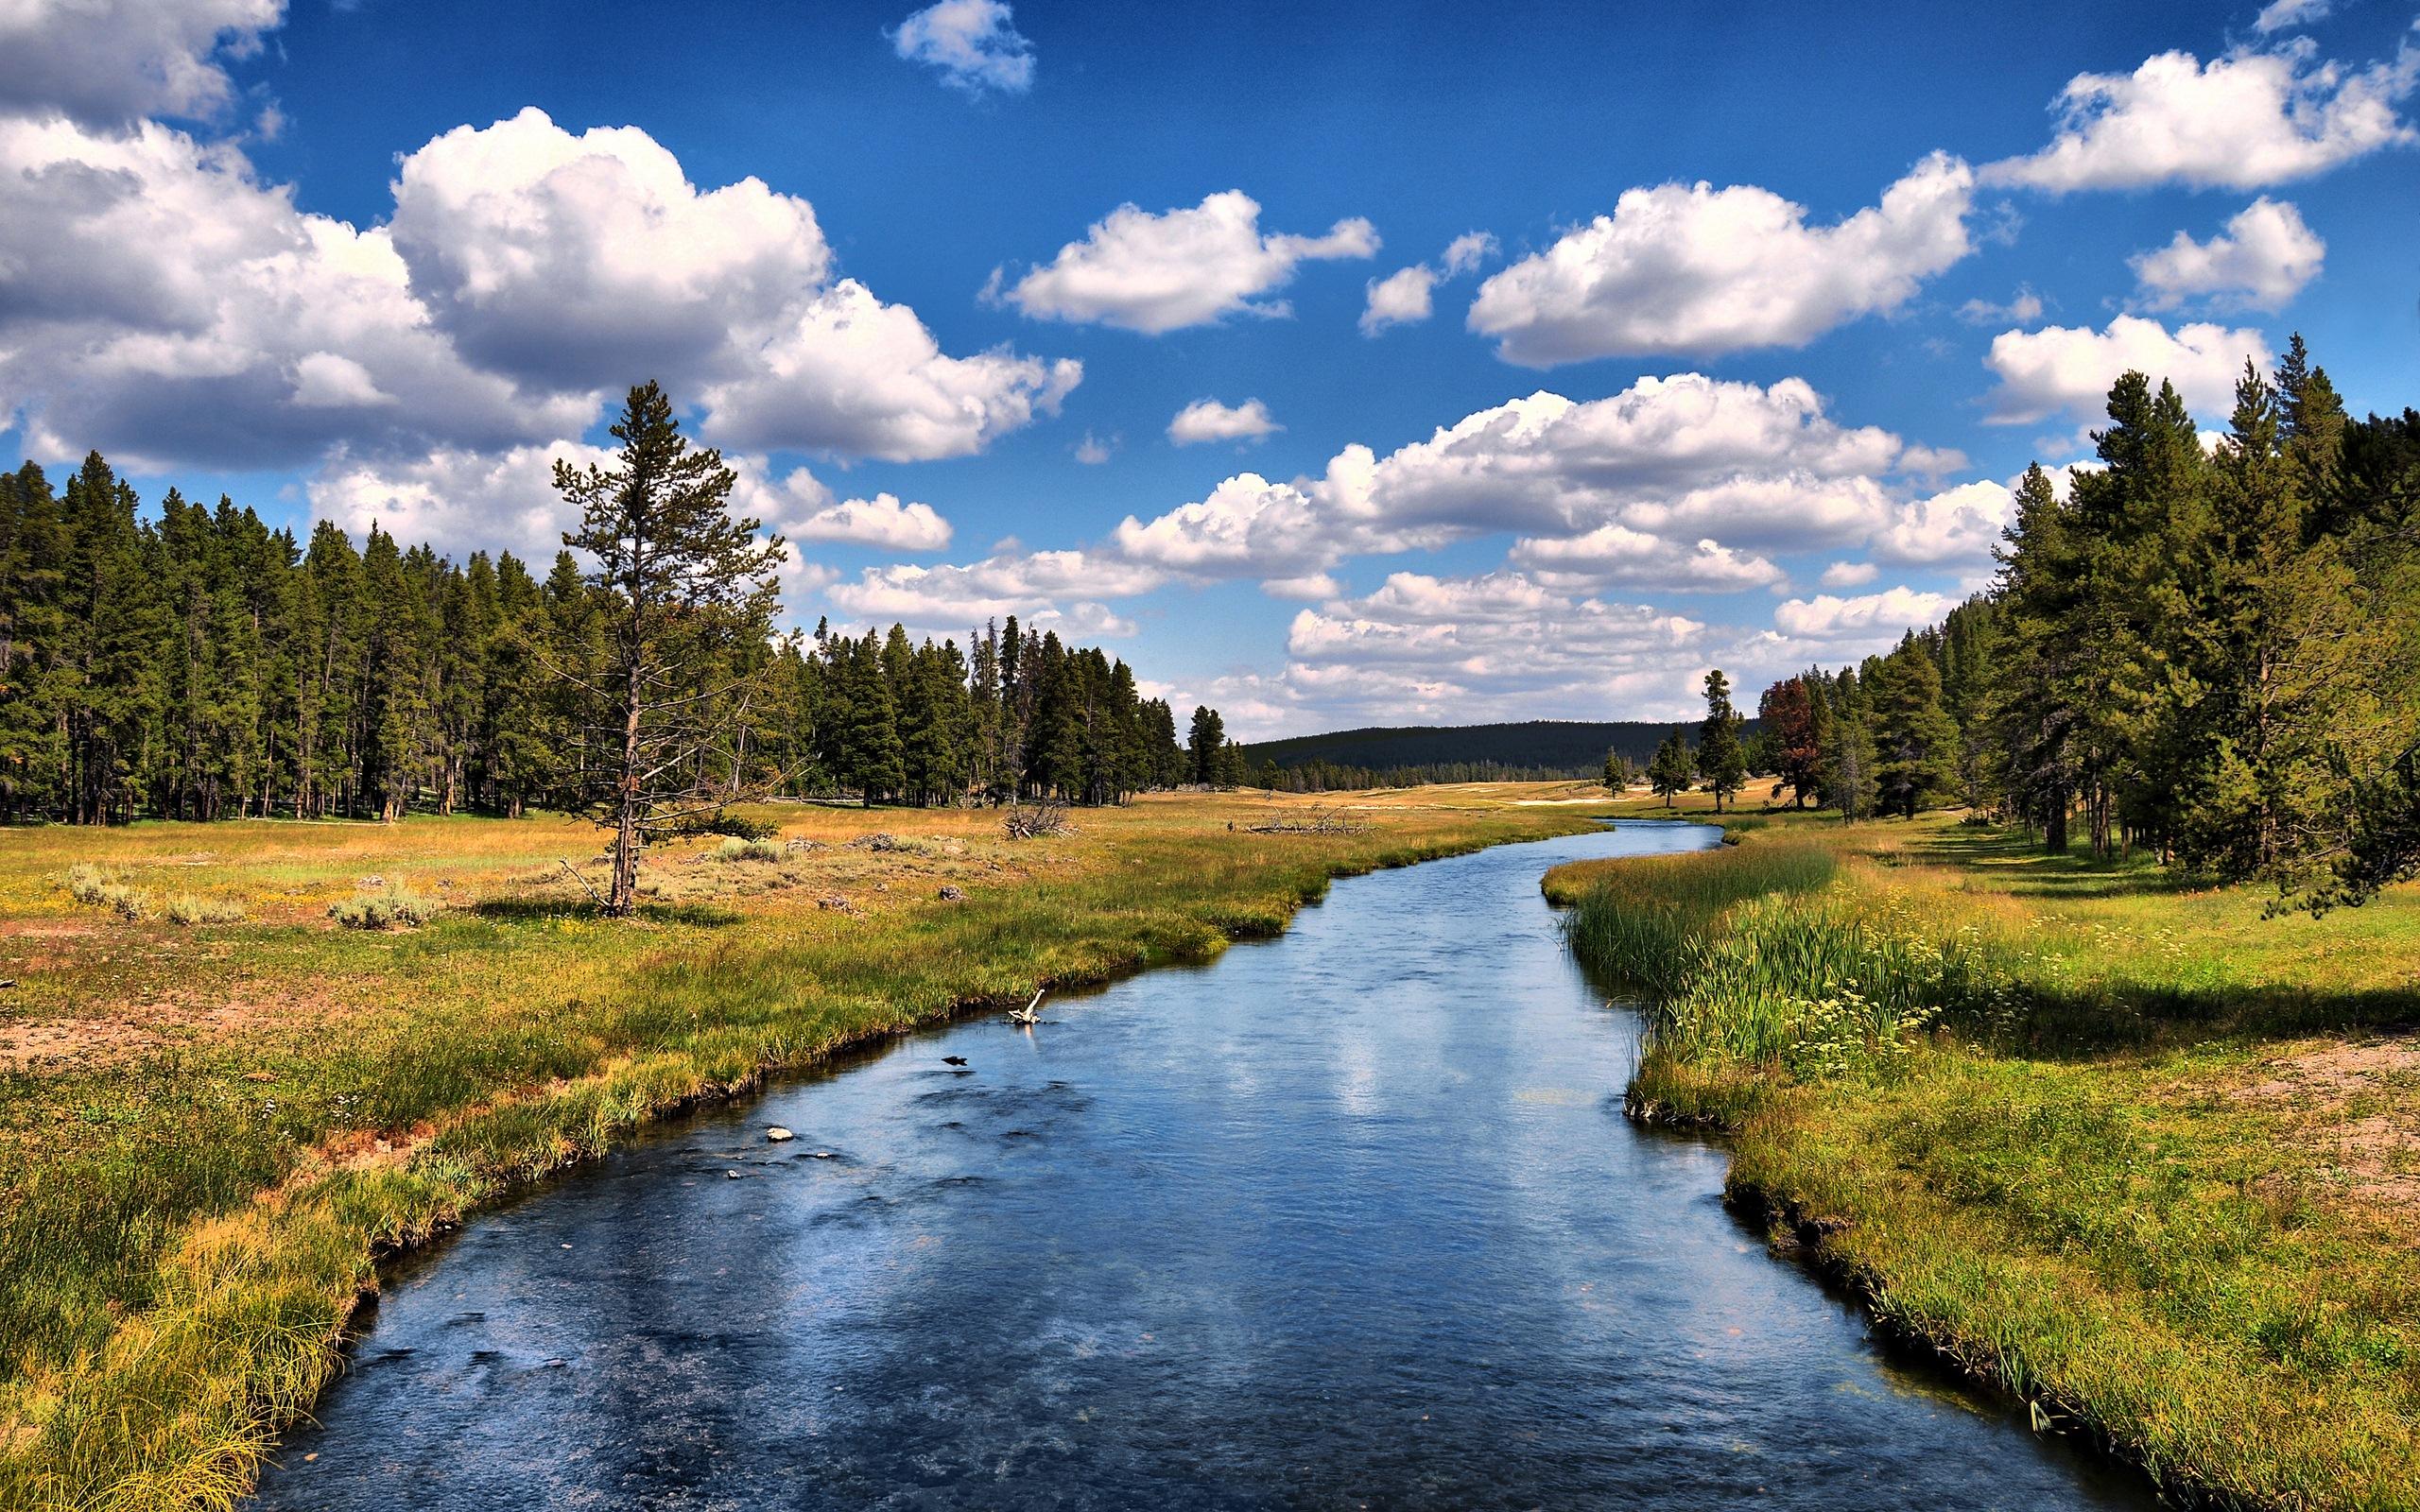 Yellowstone National Park Desktop Wallpapers FREE on Latorocom 2560x1600